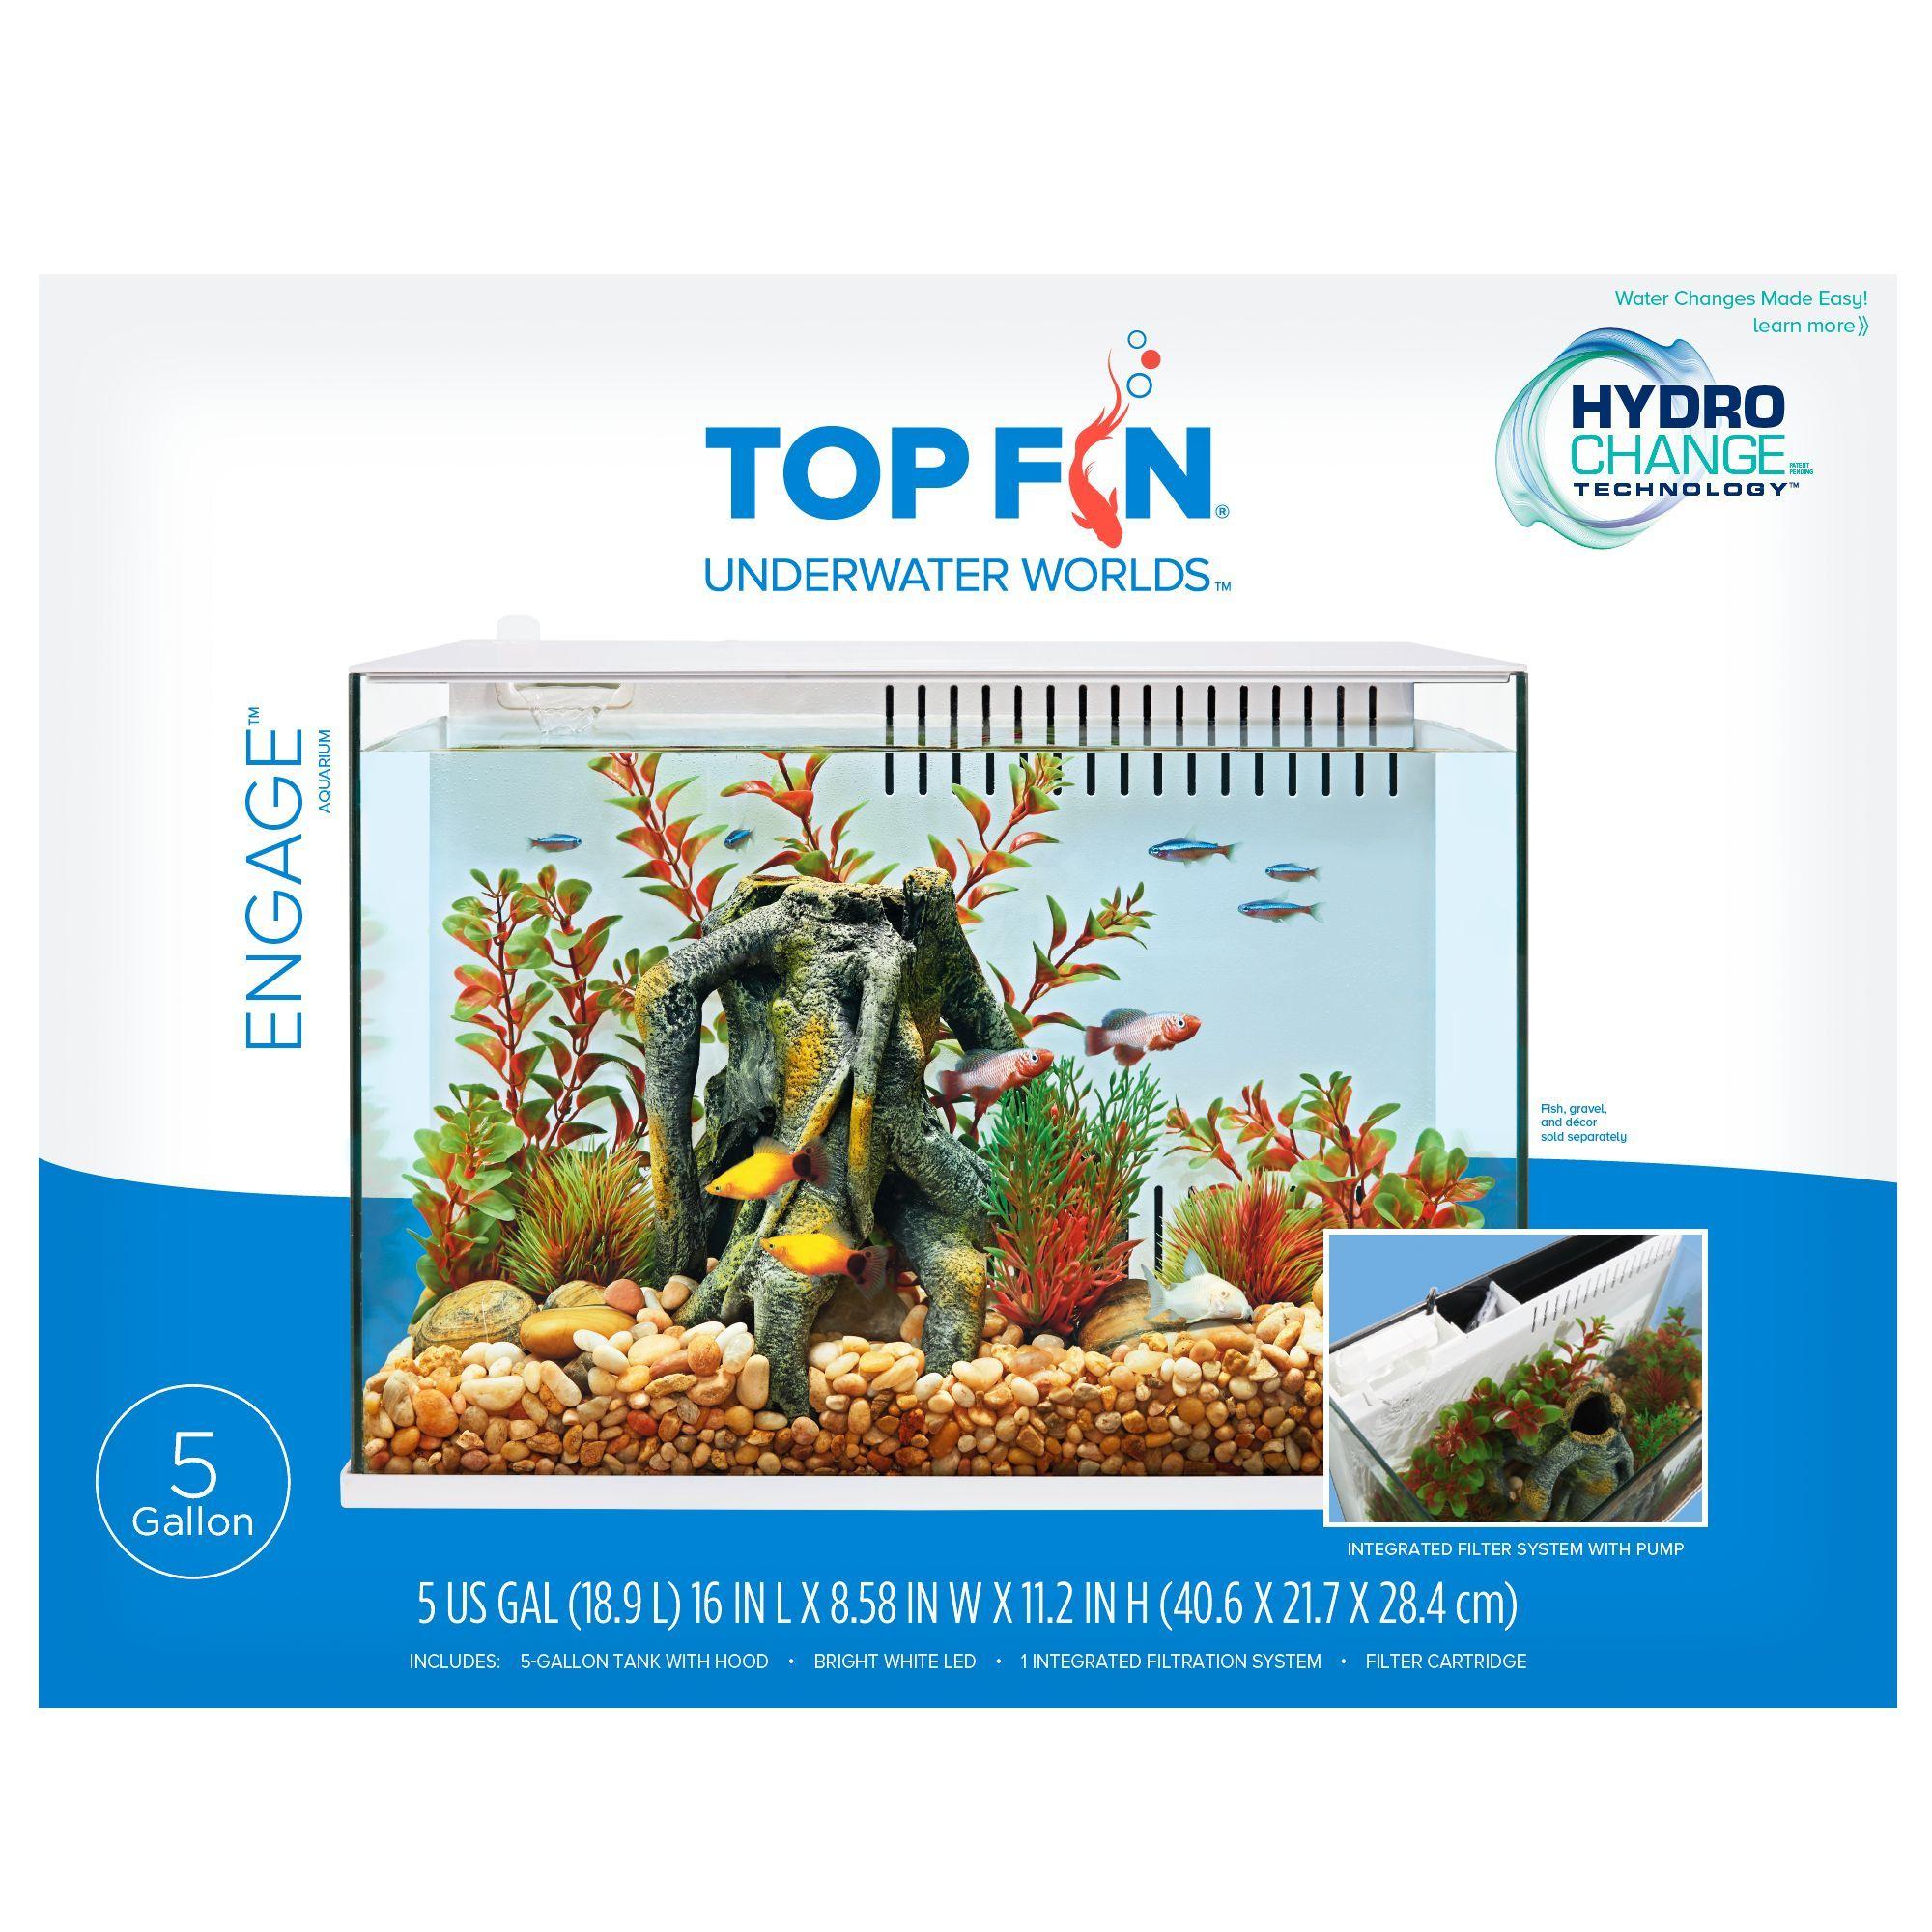 Top Fin Engage, 5 Gallon Aquarium size 5 Gal, gravel